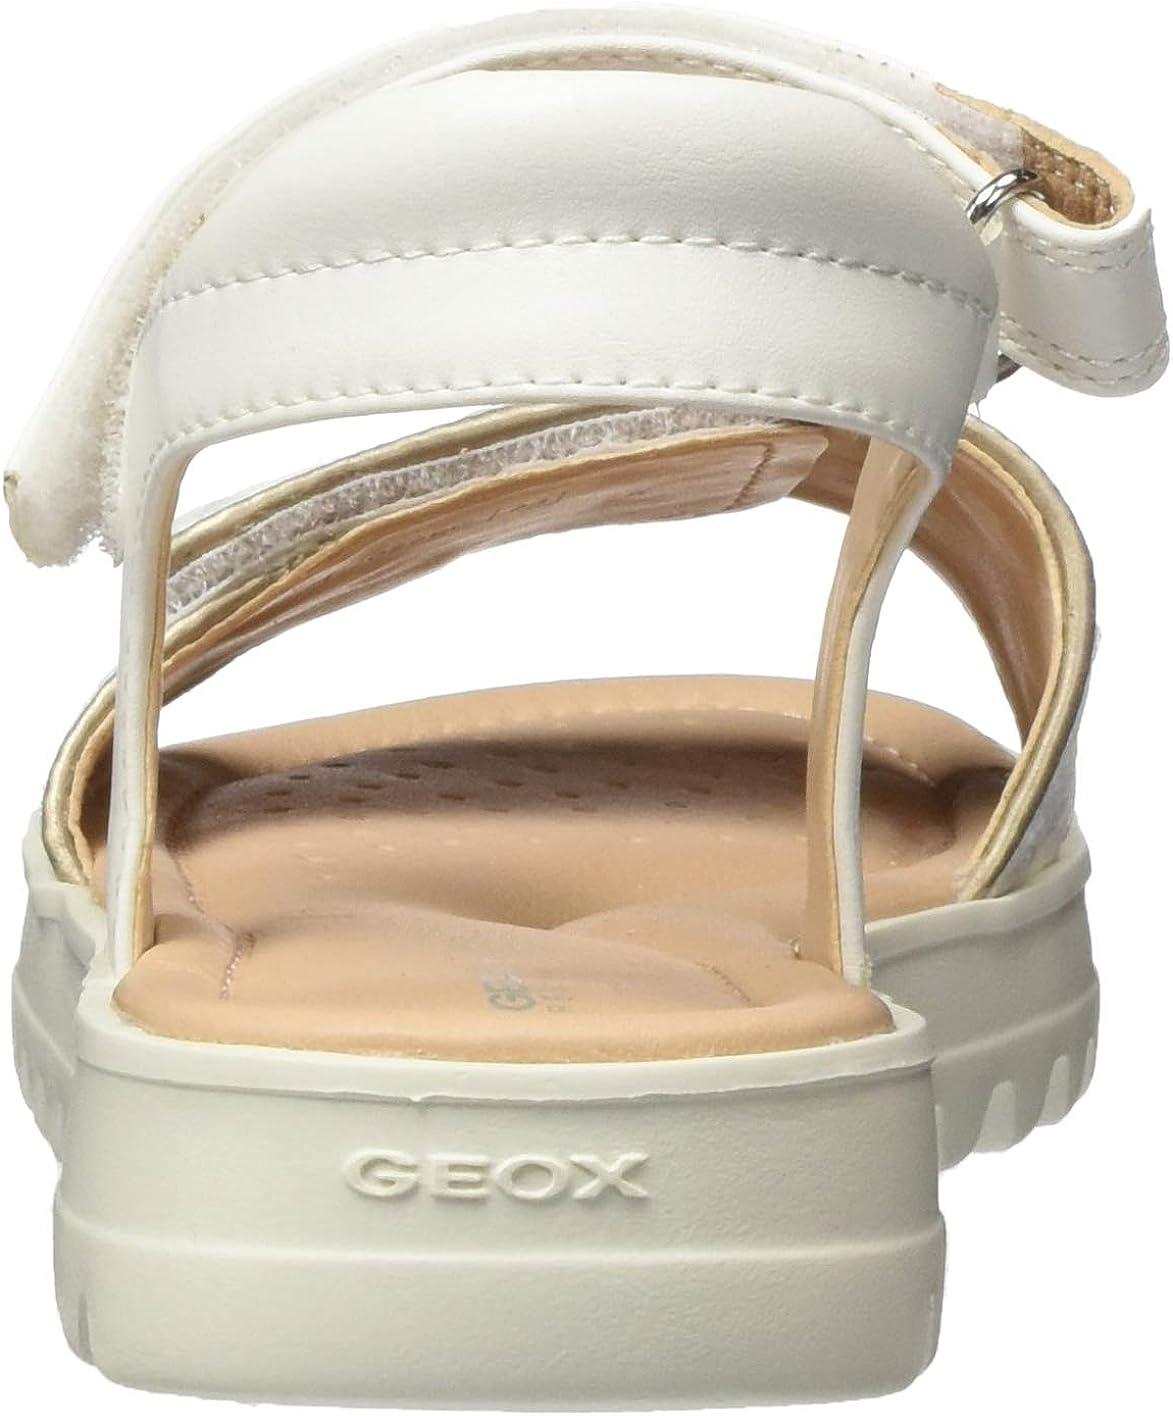 Geox M/ädchen J Coralie Girl D Peeptoe Sandalen